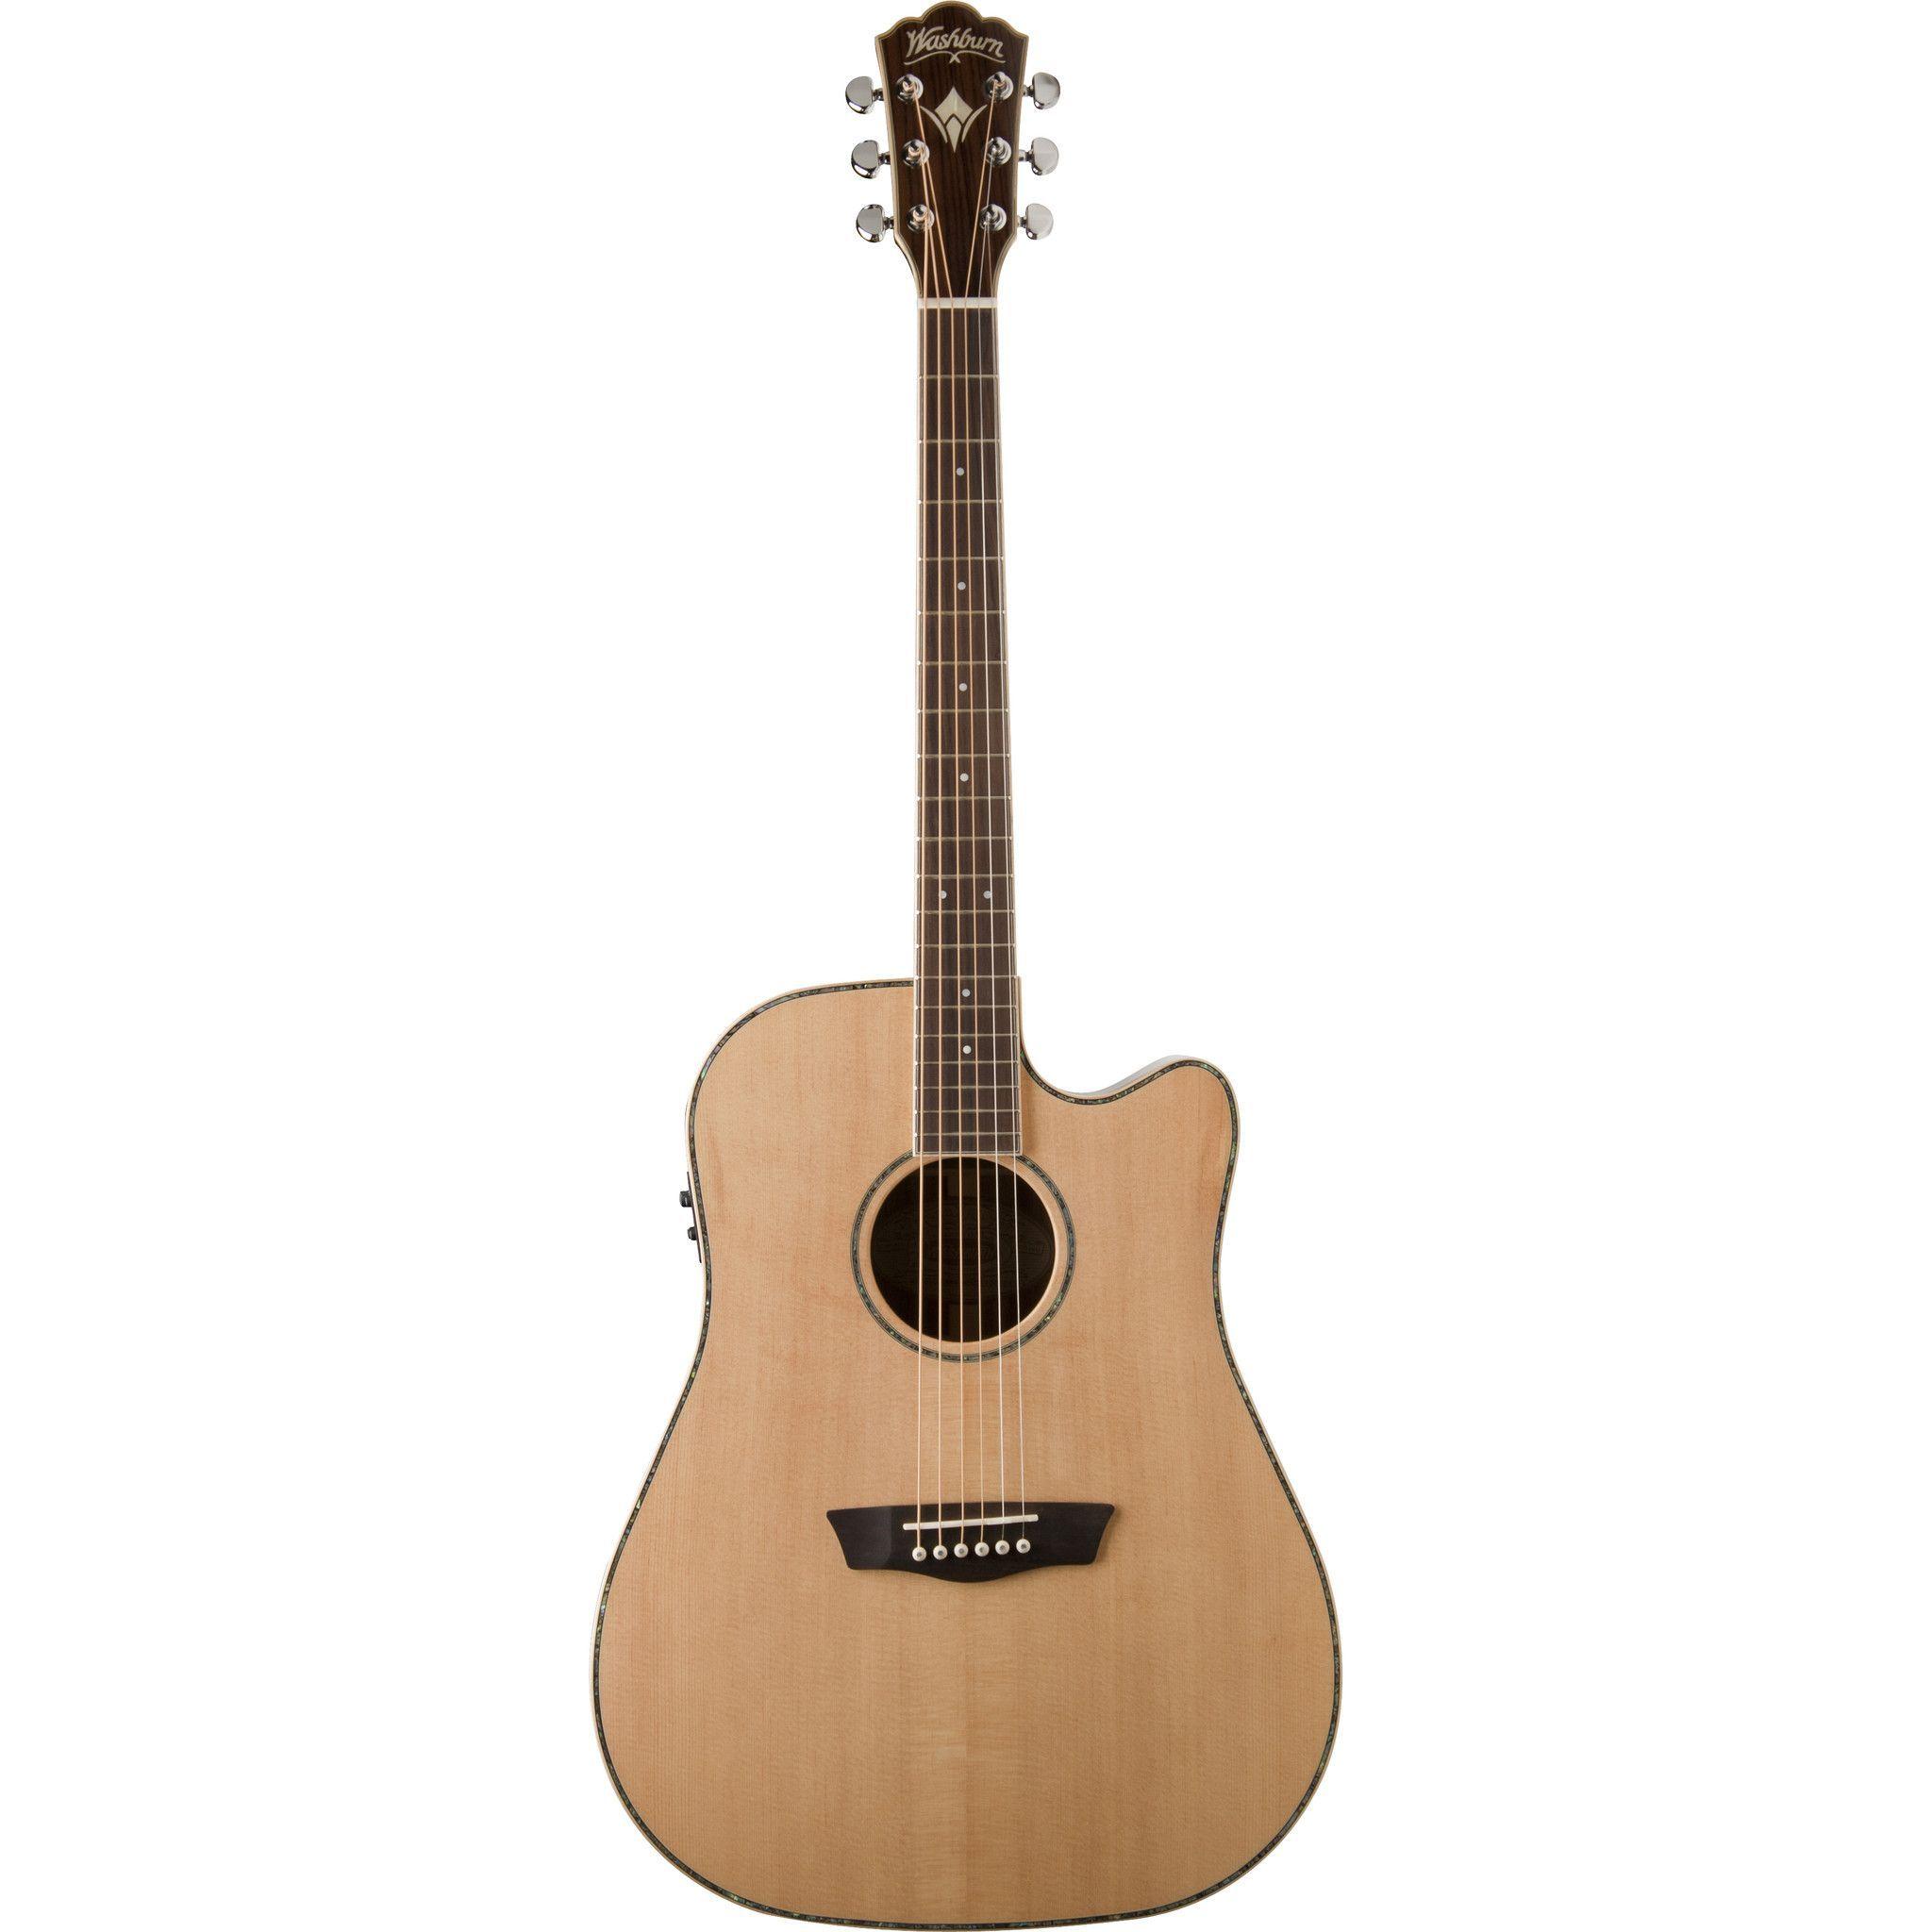 Washburn Wd25sce Acoustic Guitar Acoustic Acoustic Guitar Guitar